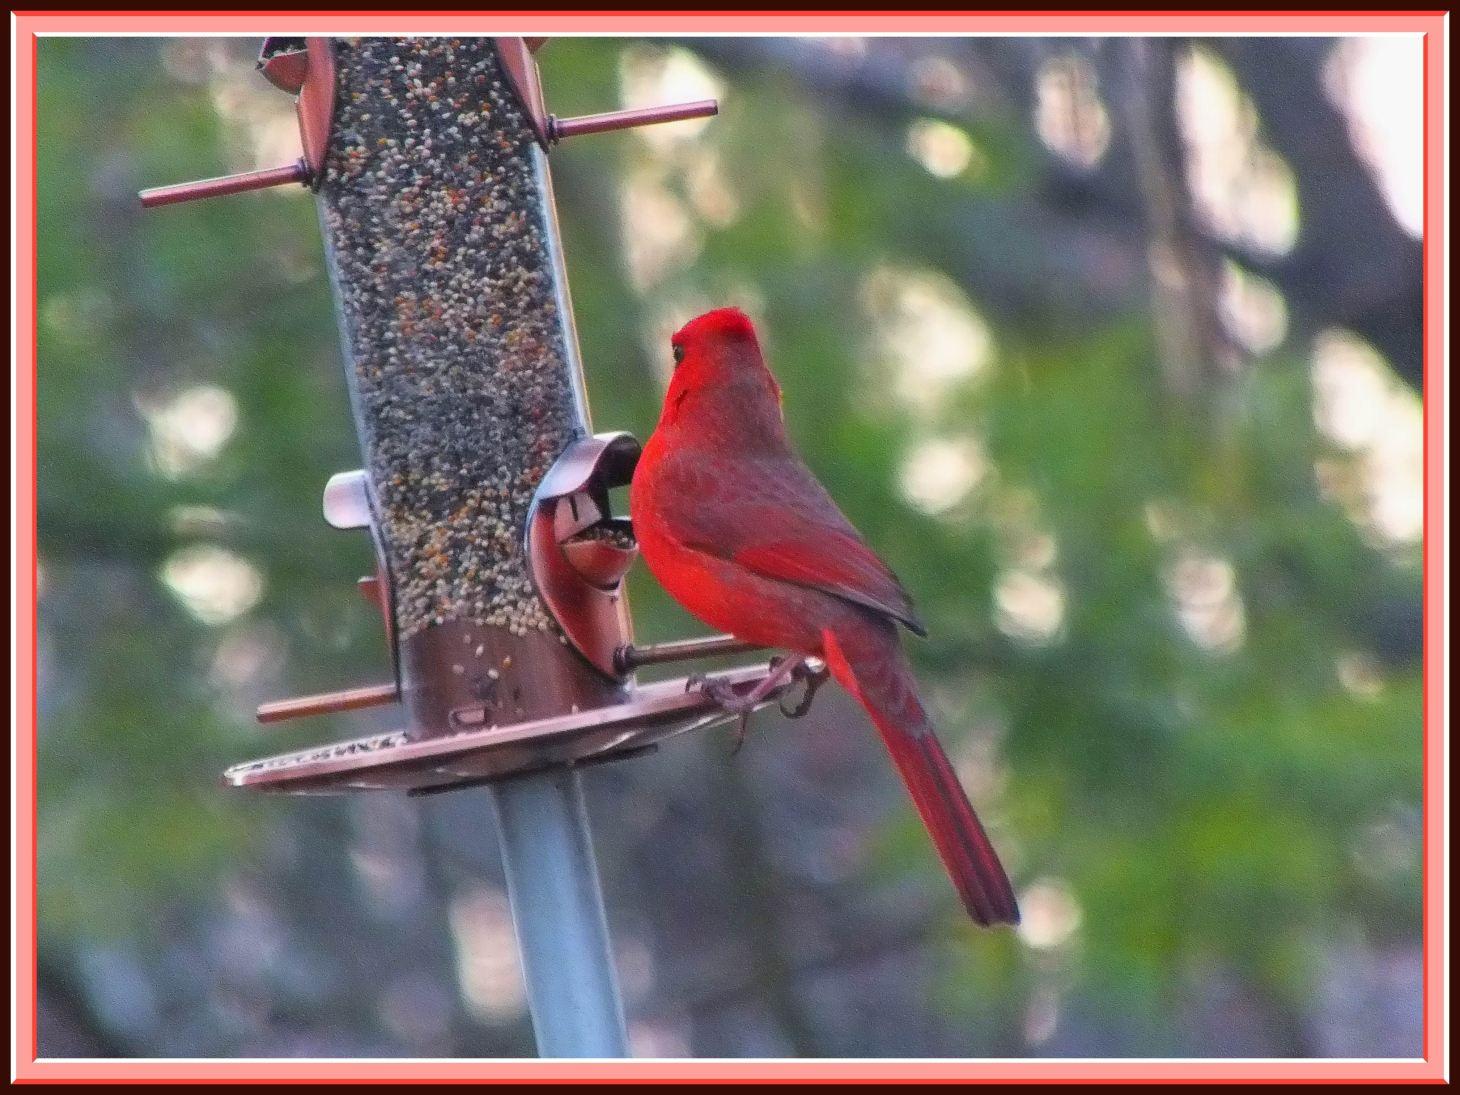 Red Cardinal. Photo by Thomas Peace c. 2016